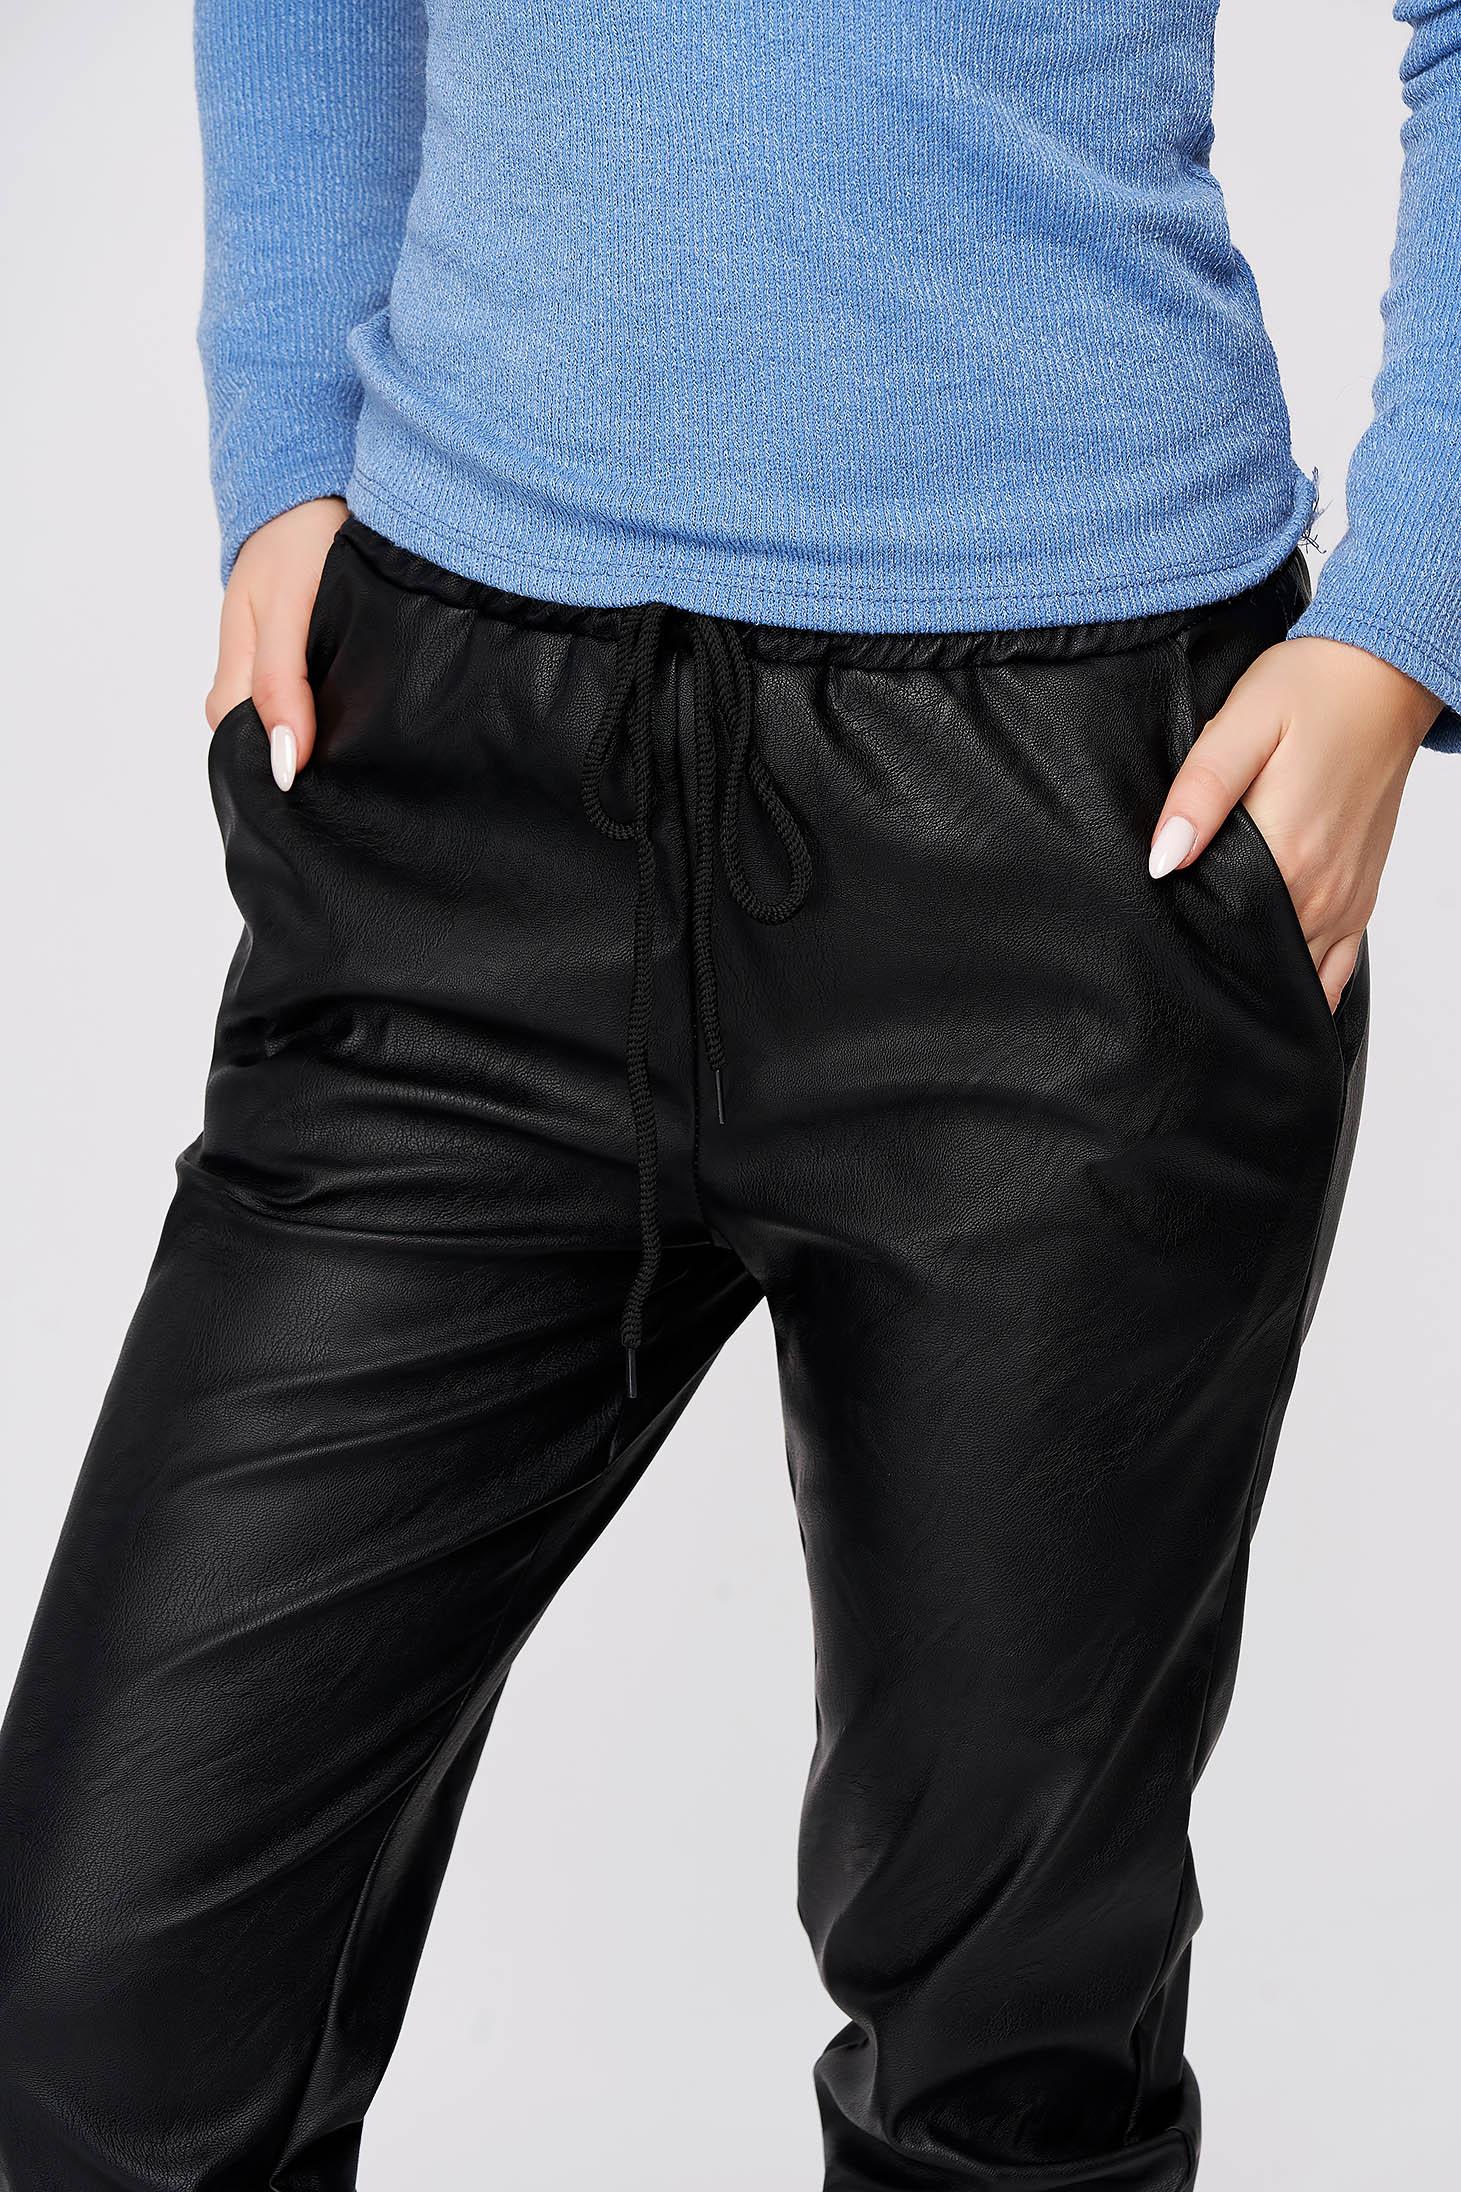 Black trousers casual medium waist elastic waist faux leather